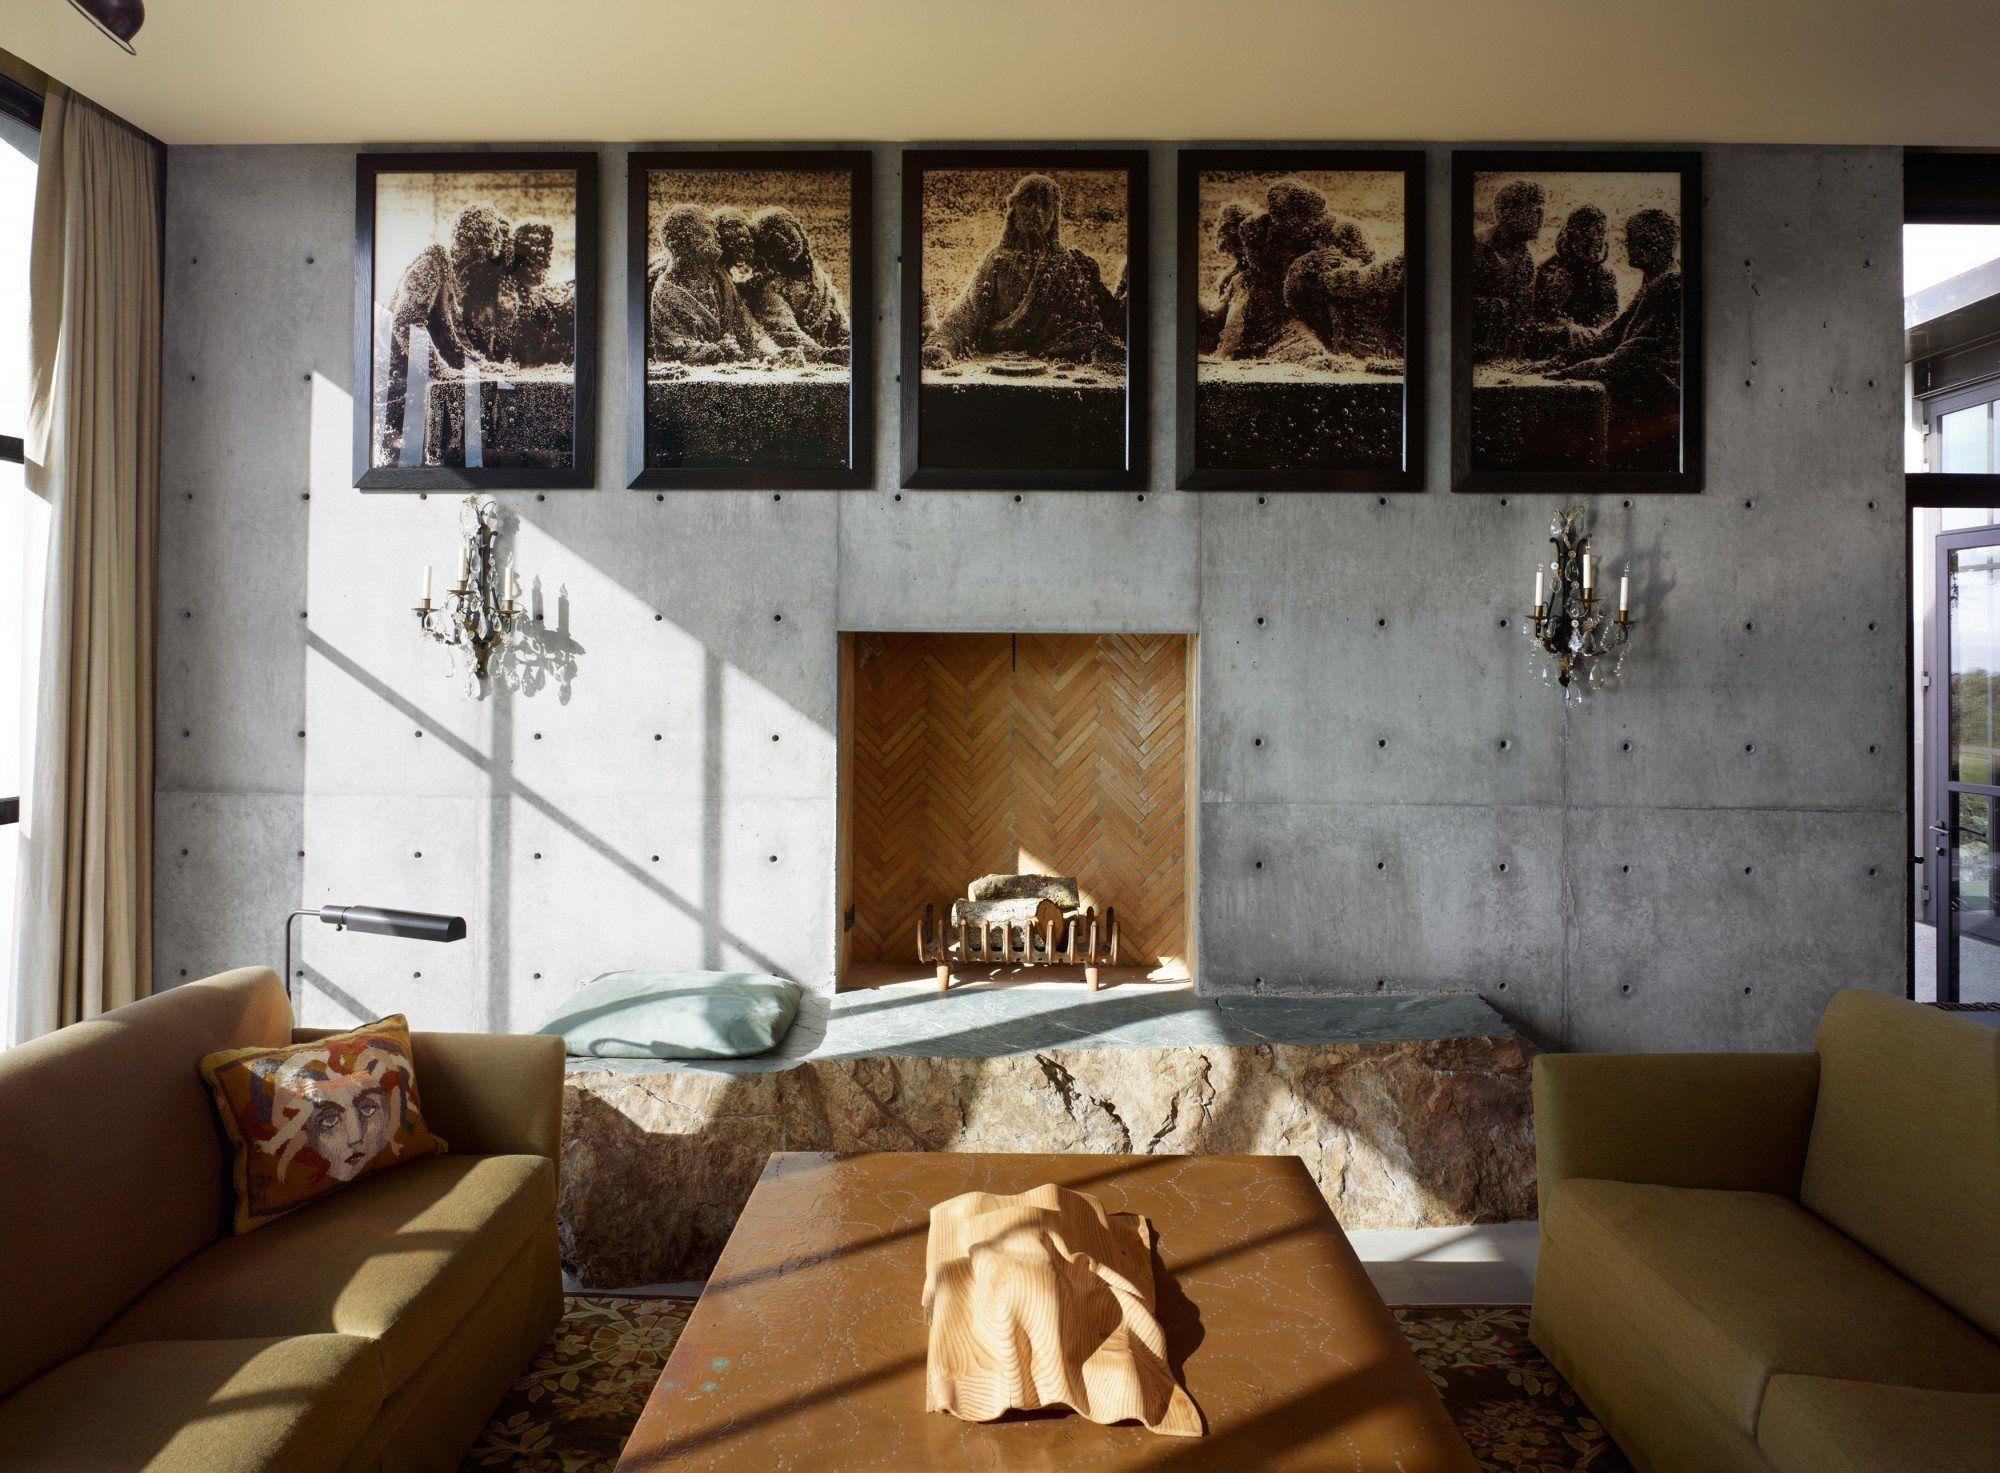 Simple house interior design ideas pin by scott wright art on interiorsdesign  pinterest  rock